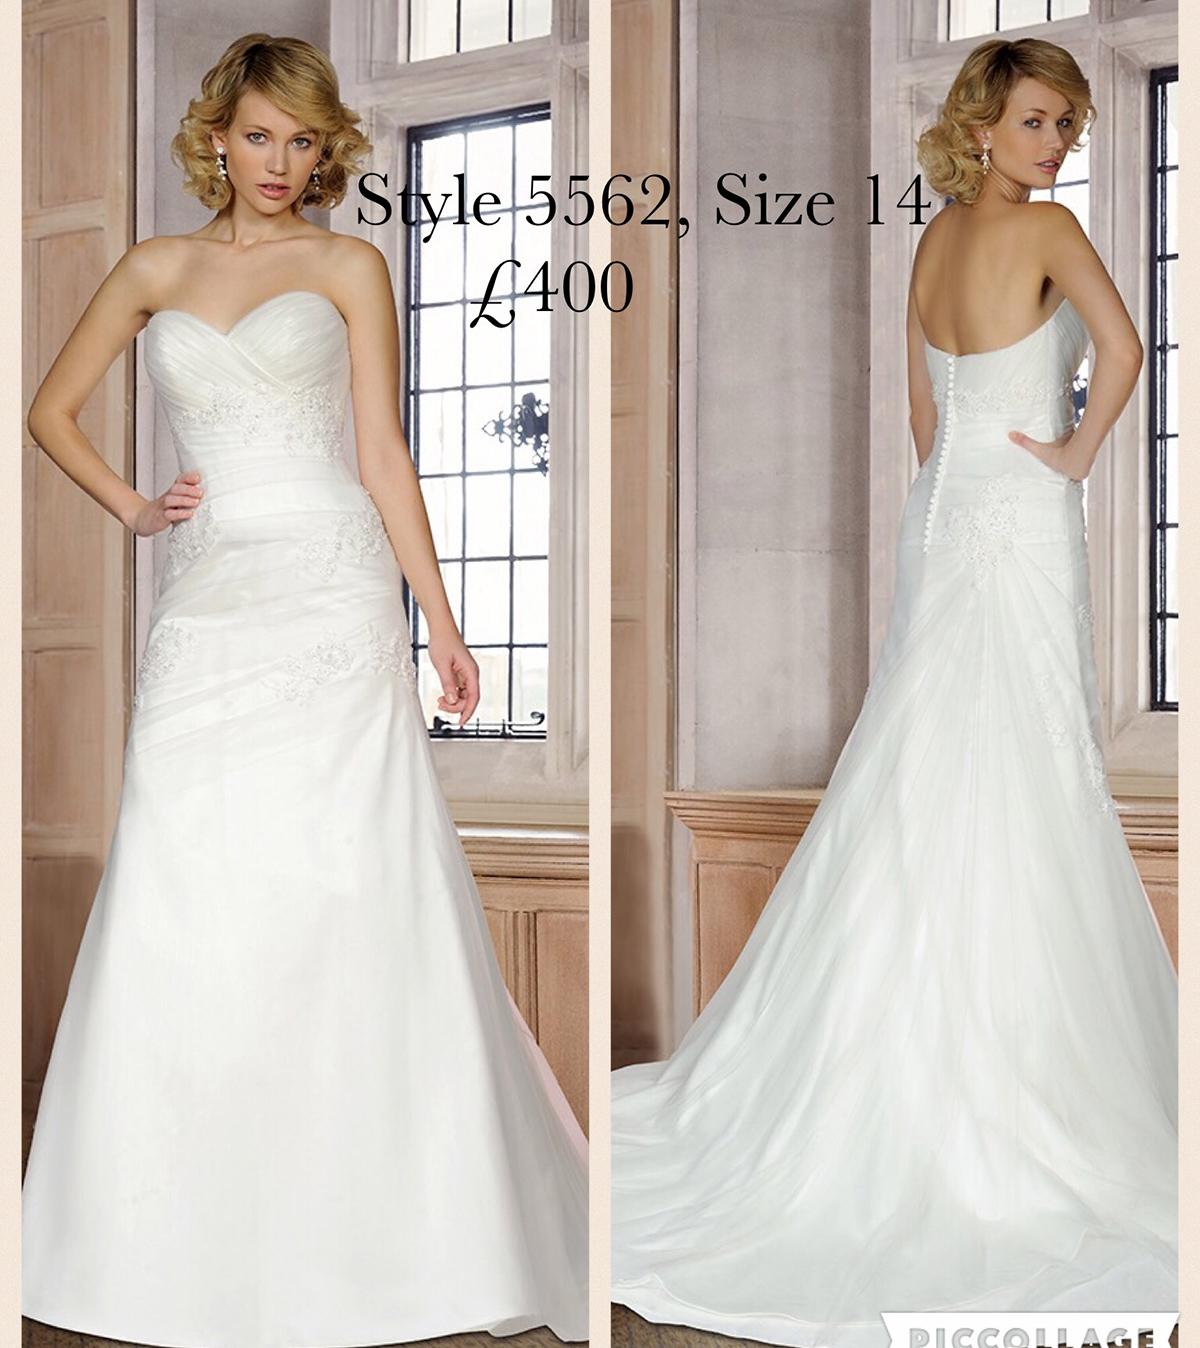 Bridal dresses sale uk discount wedding dresses for Cheap beautiful wedding dresses for sale